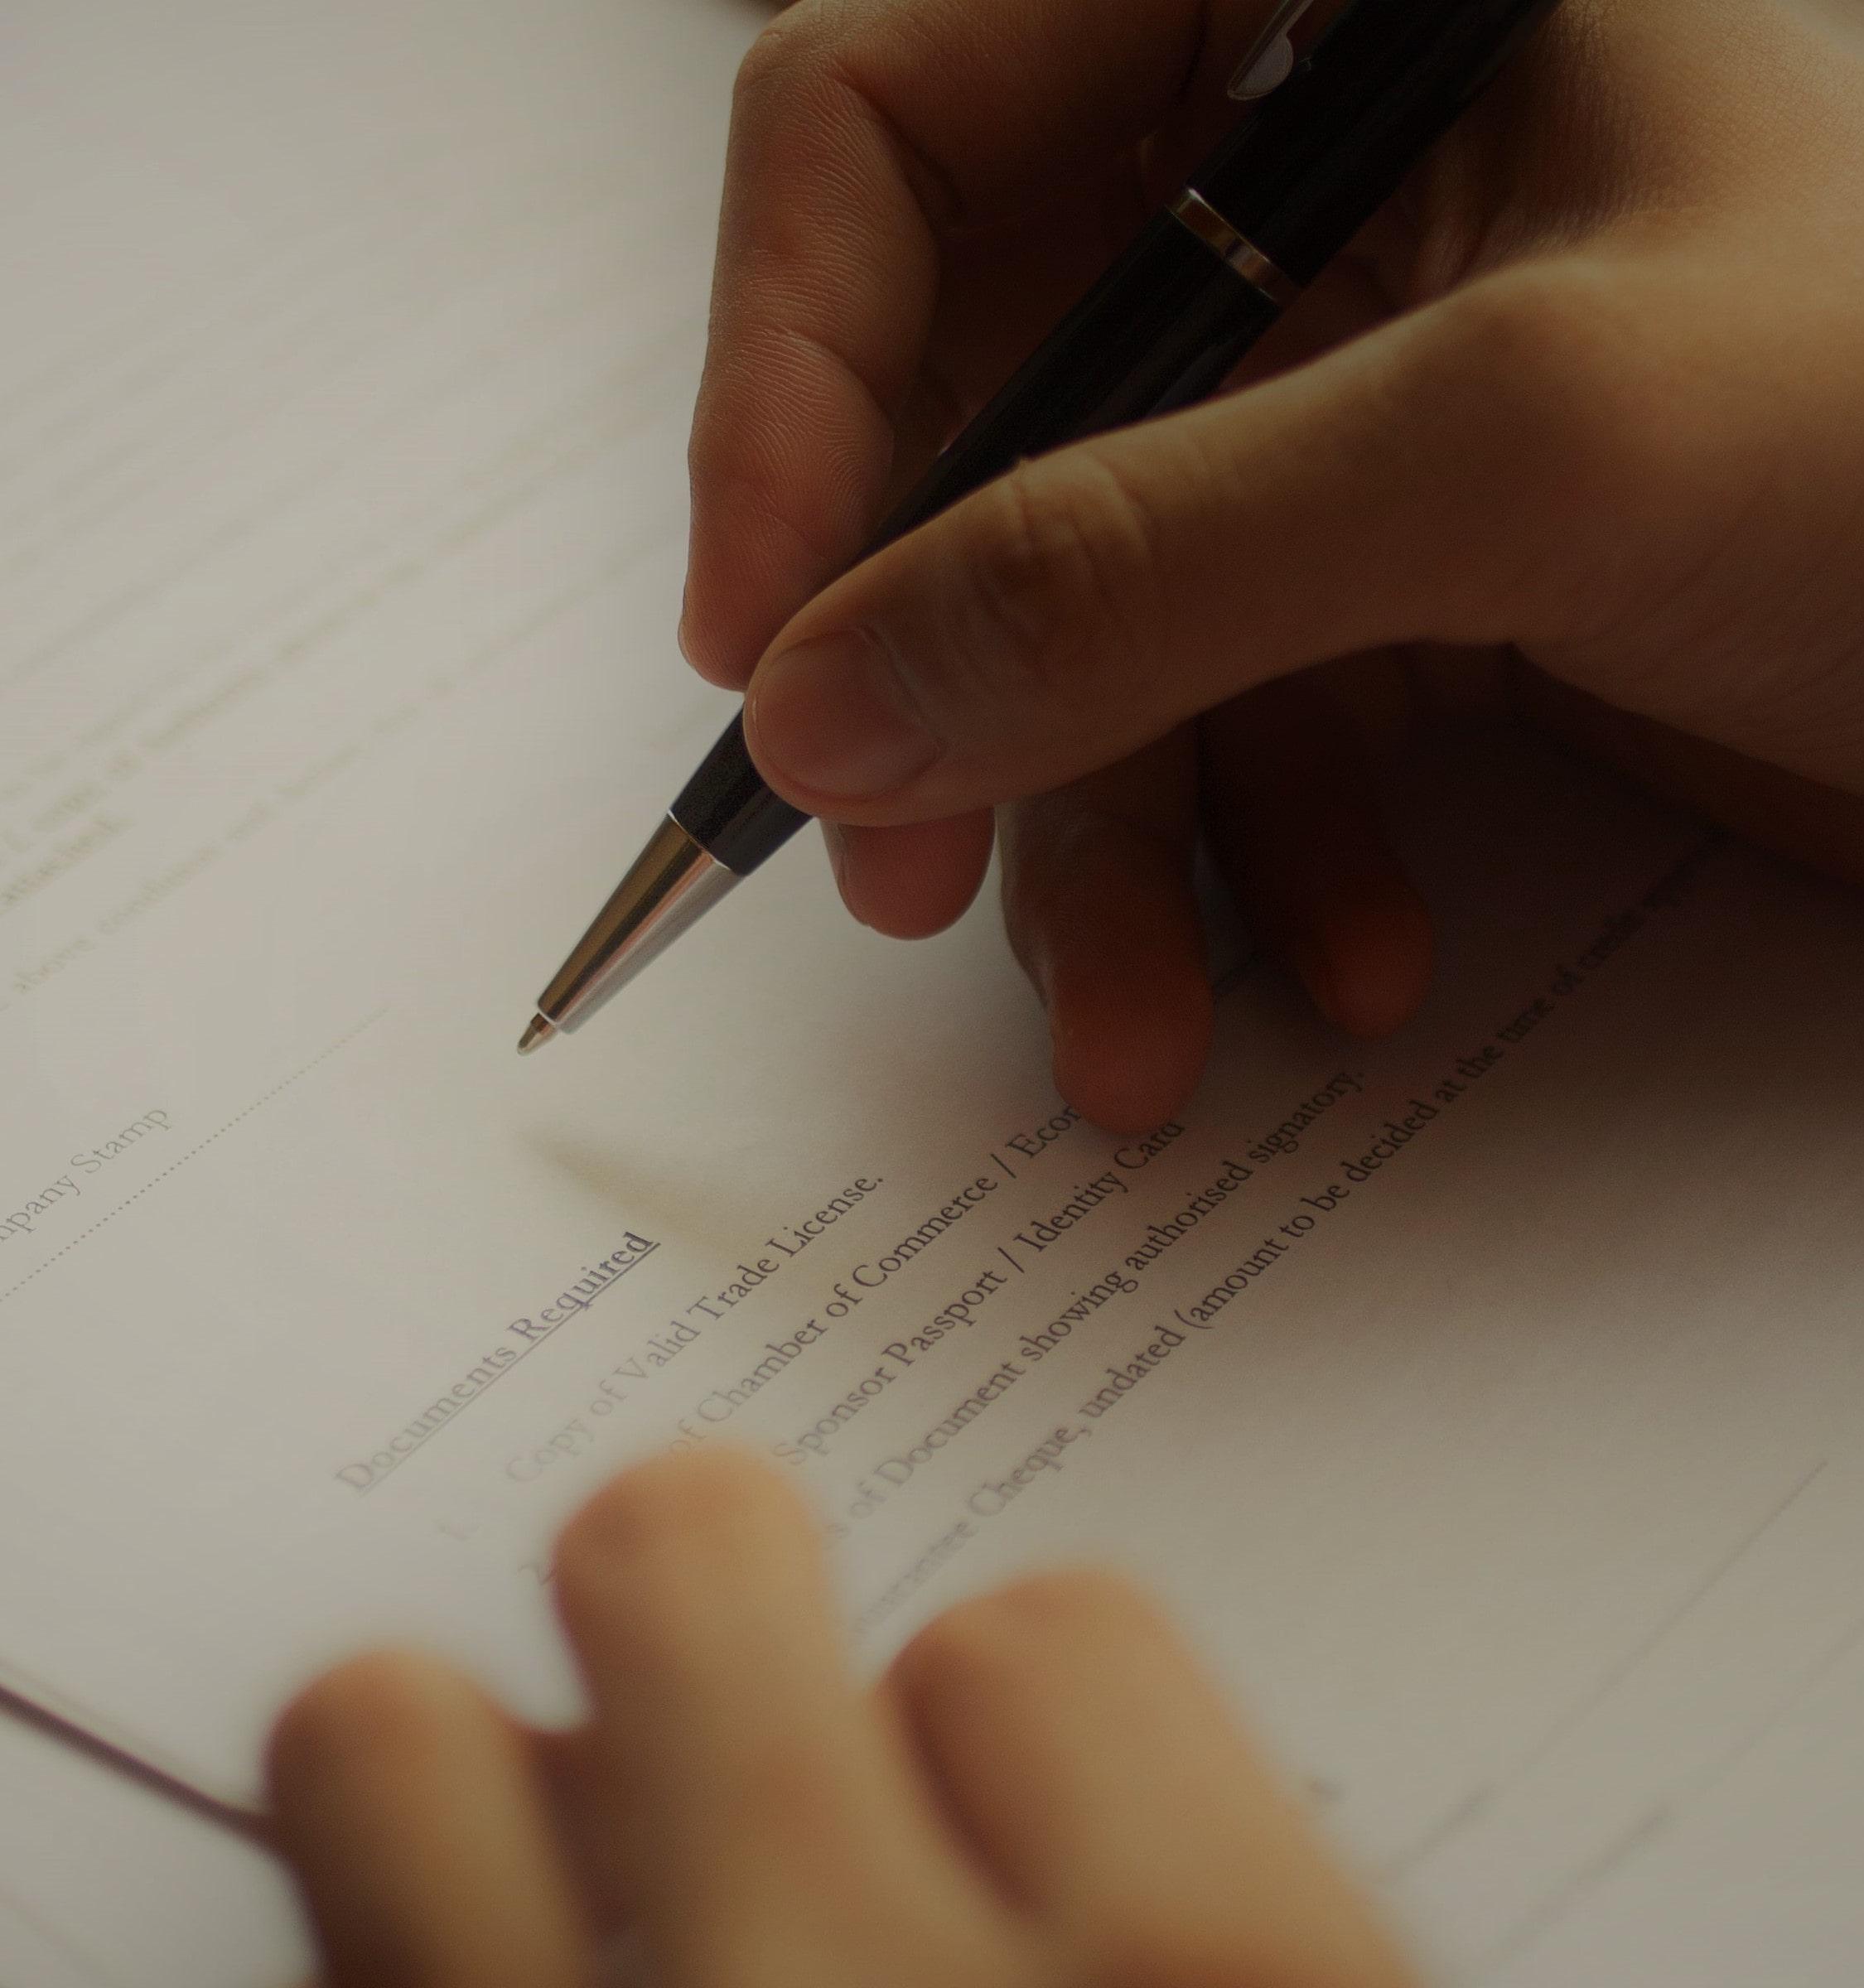 businessman-examining-papers-at-table-min-min.jpg